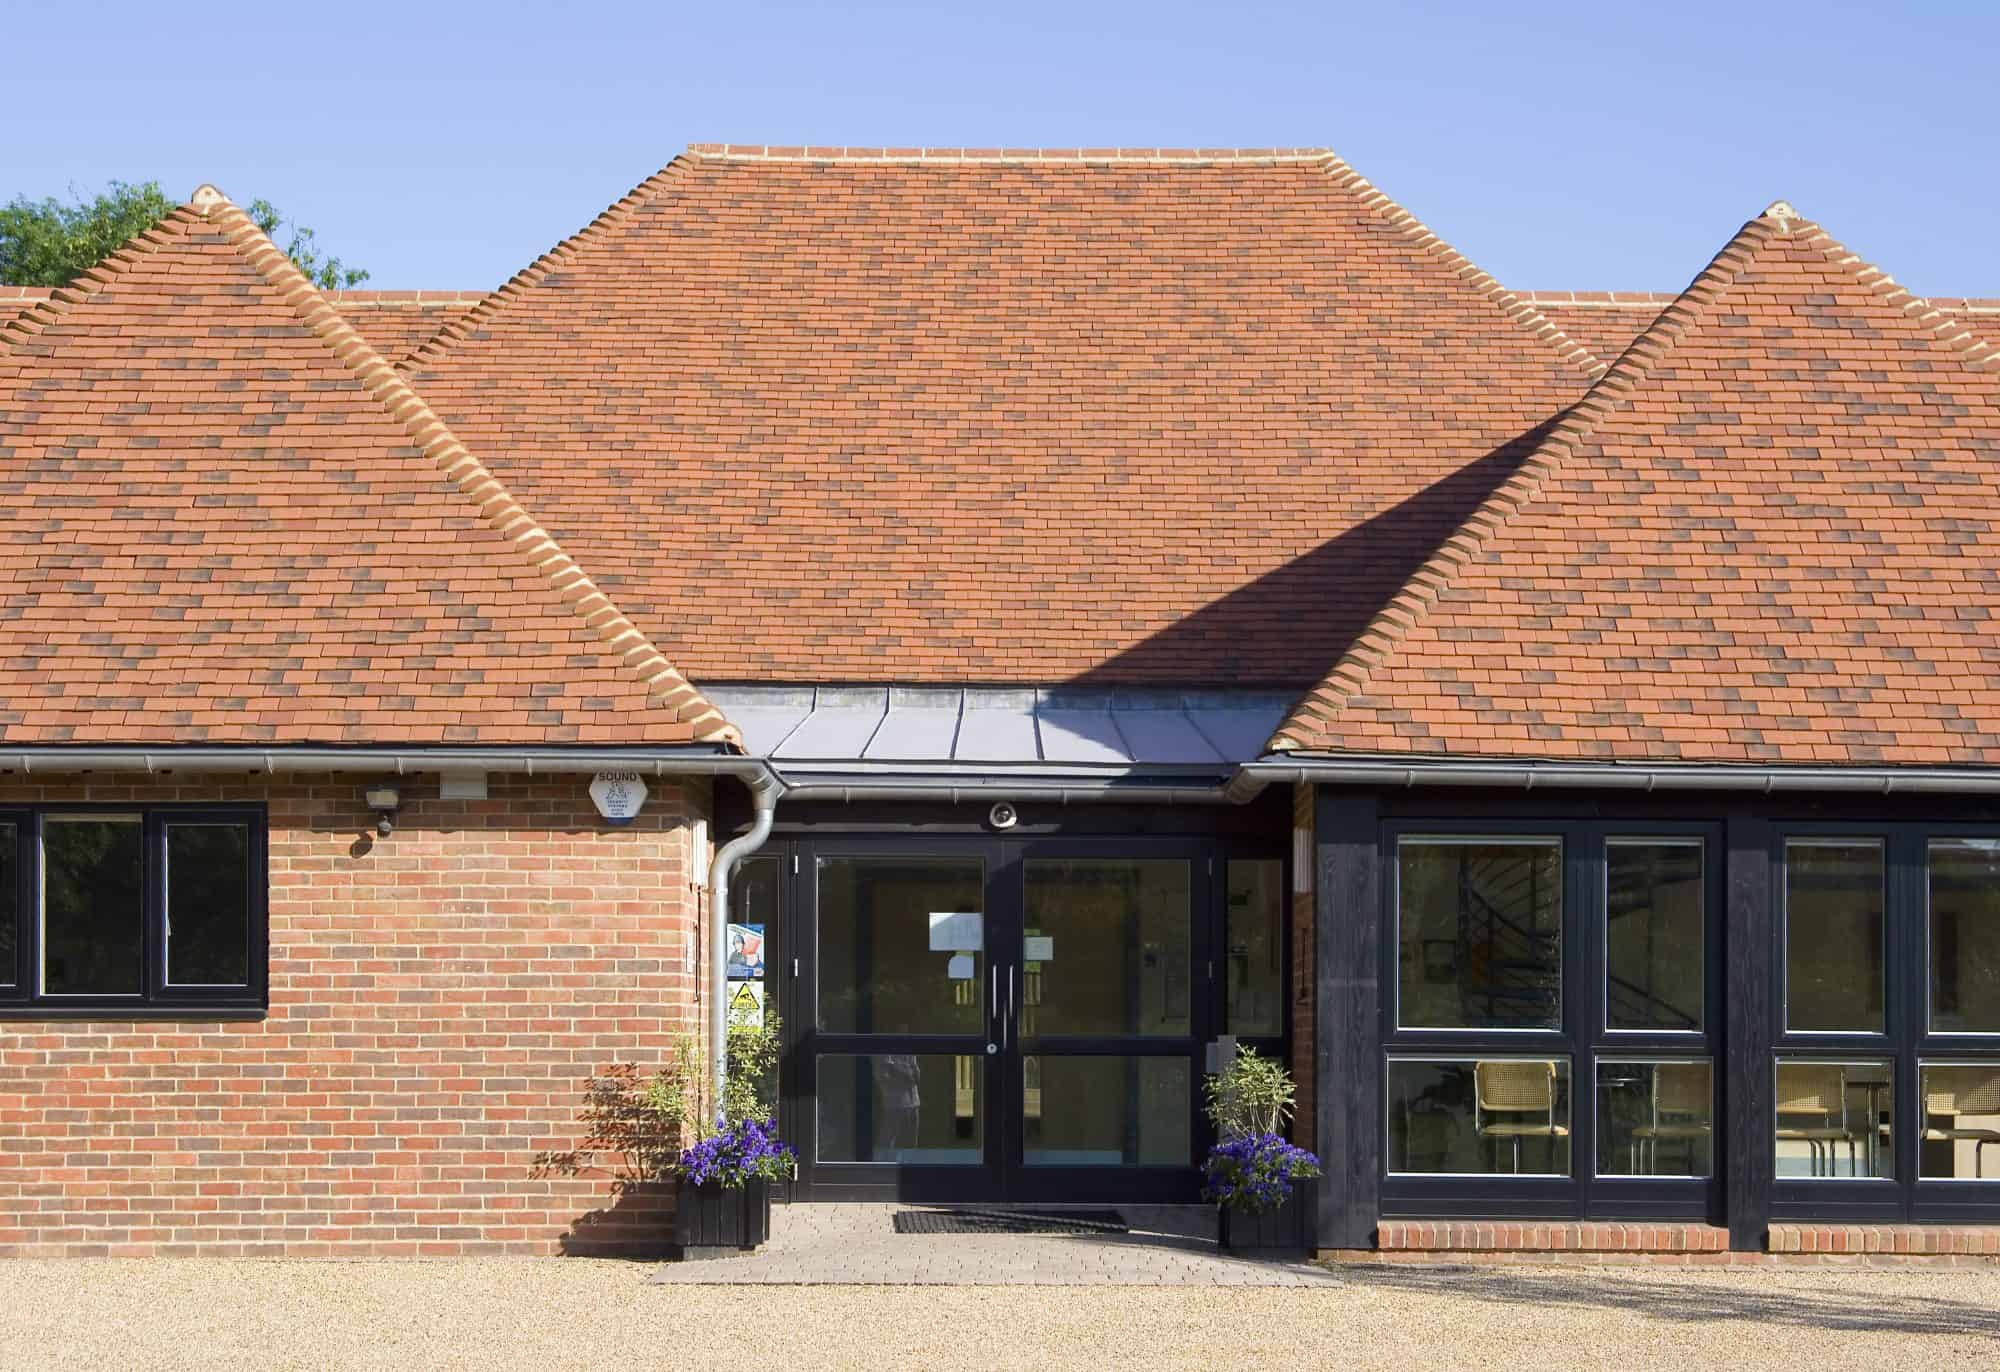 Petham Village Hall Lee Evans Partnership